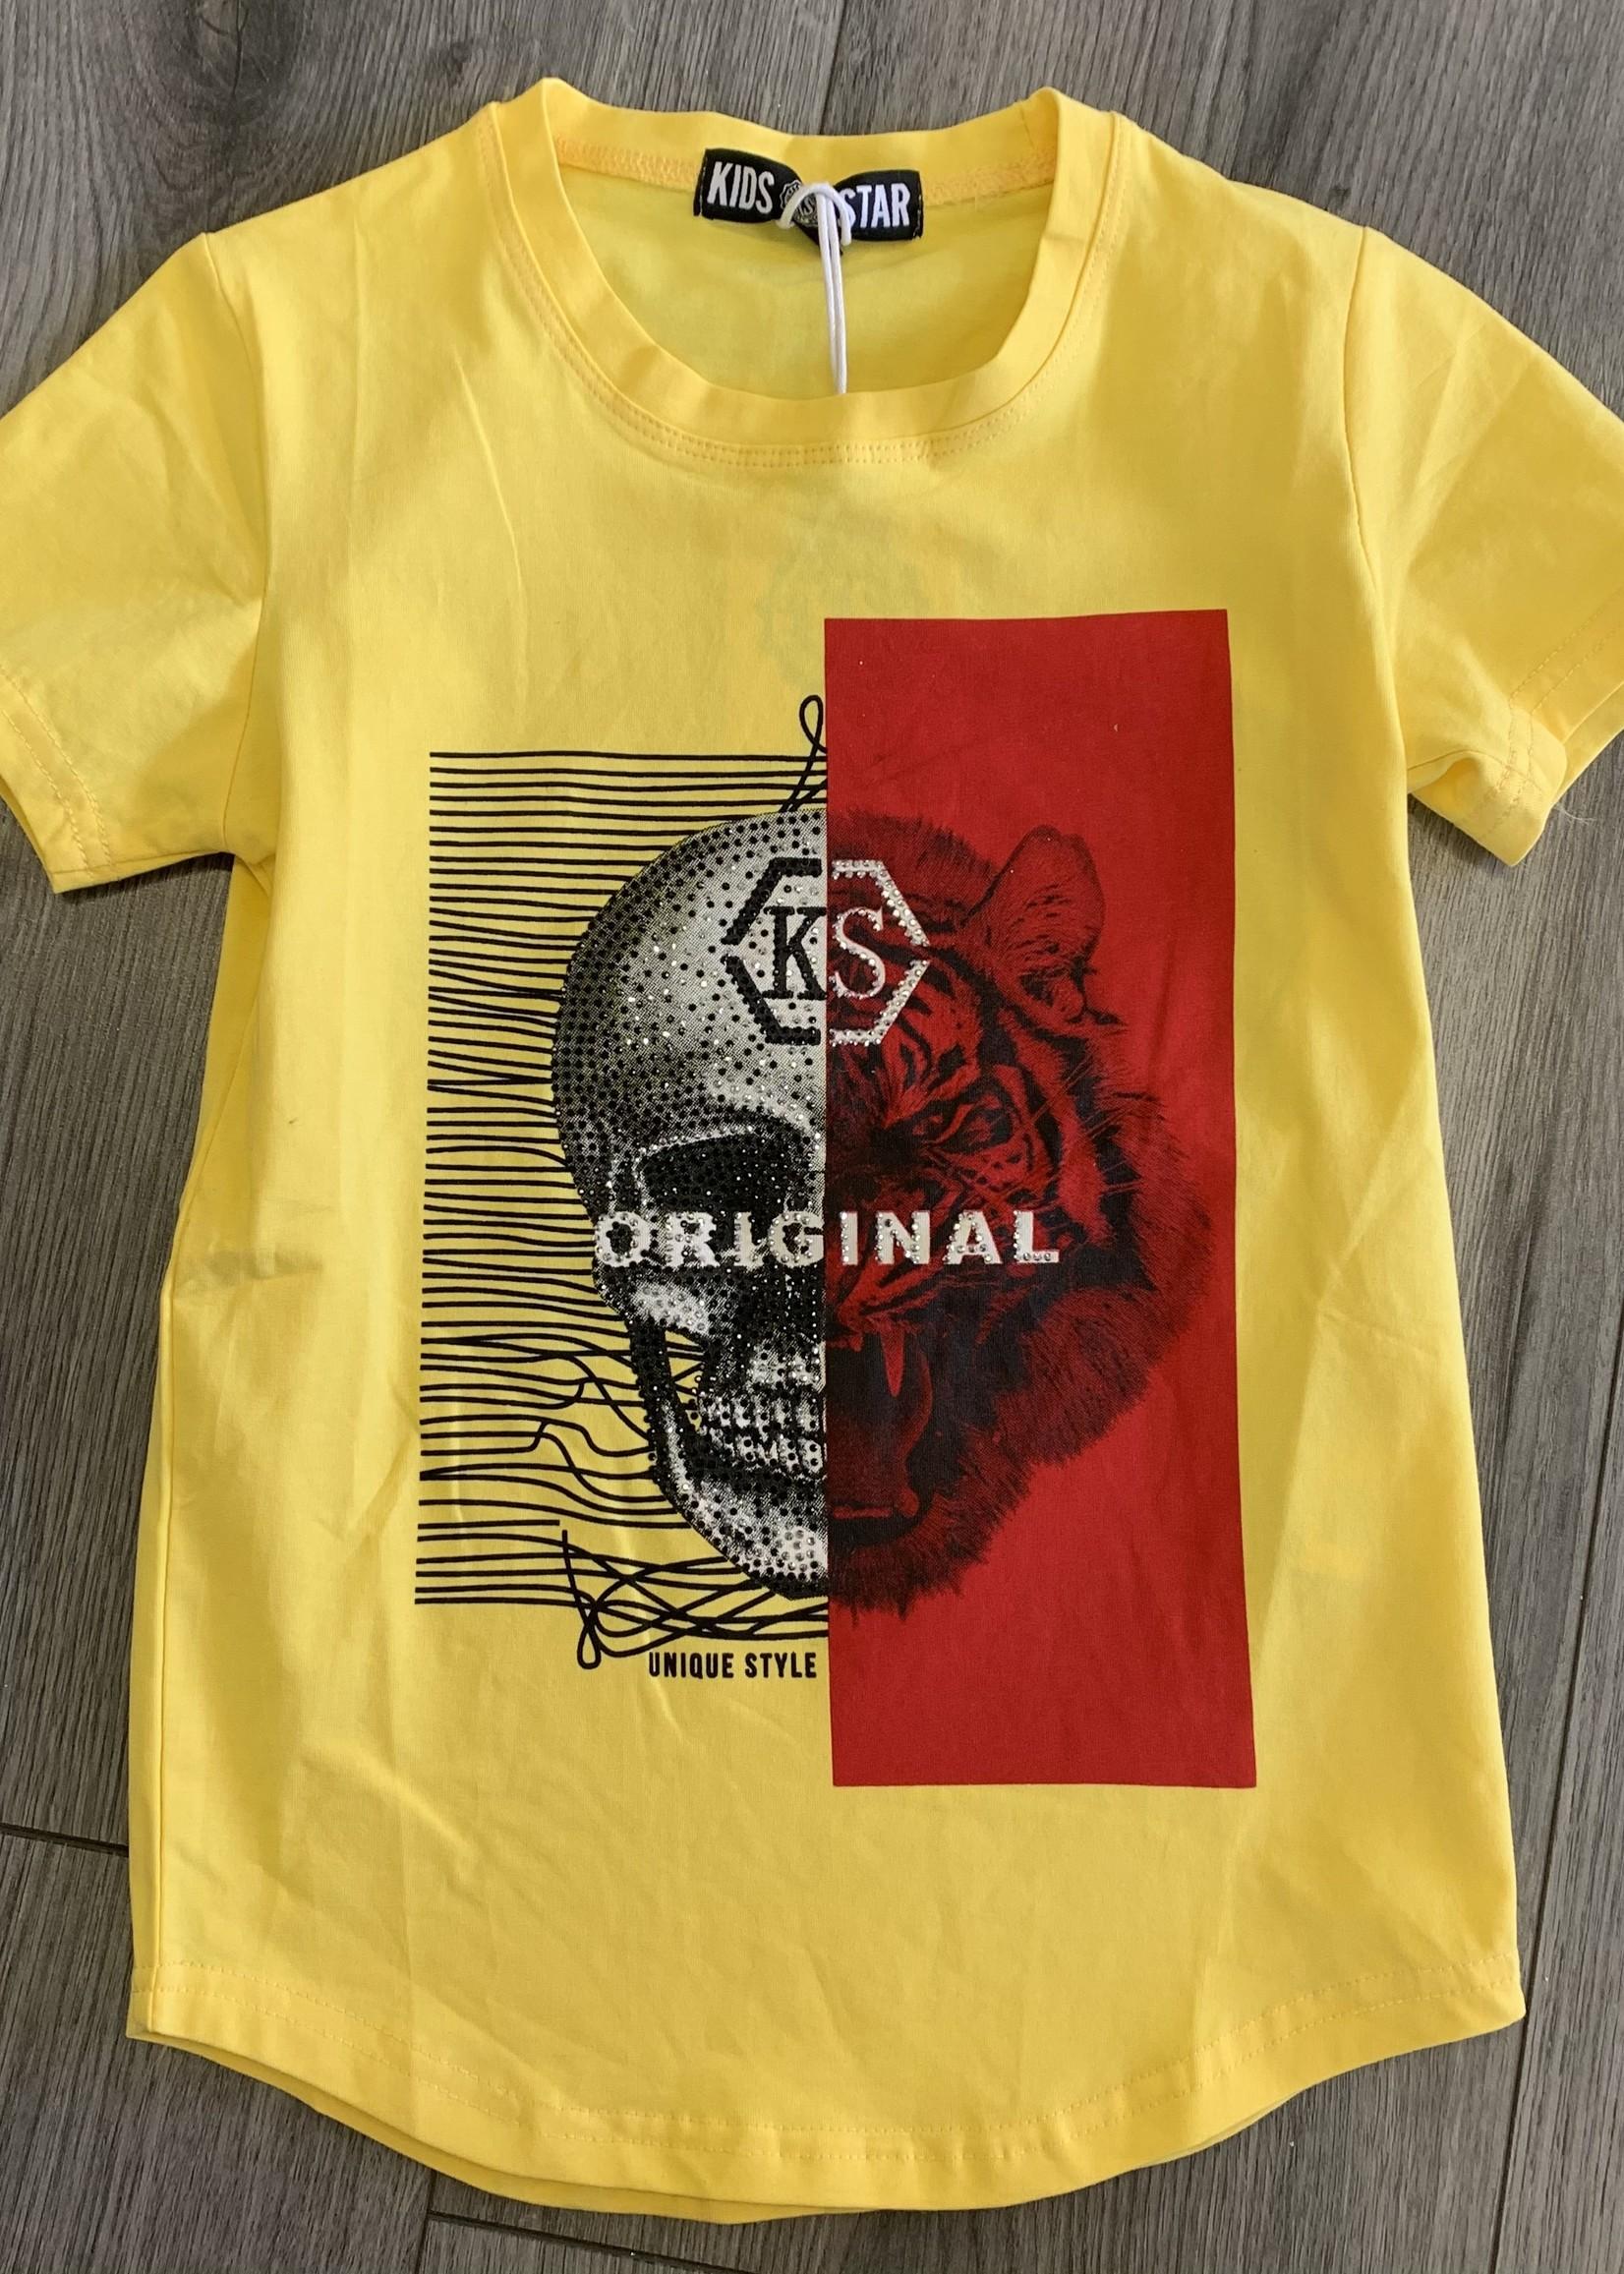 Divanis Divanis look a like pp shirt